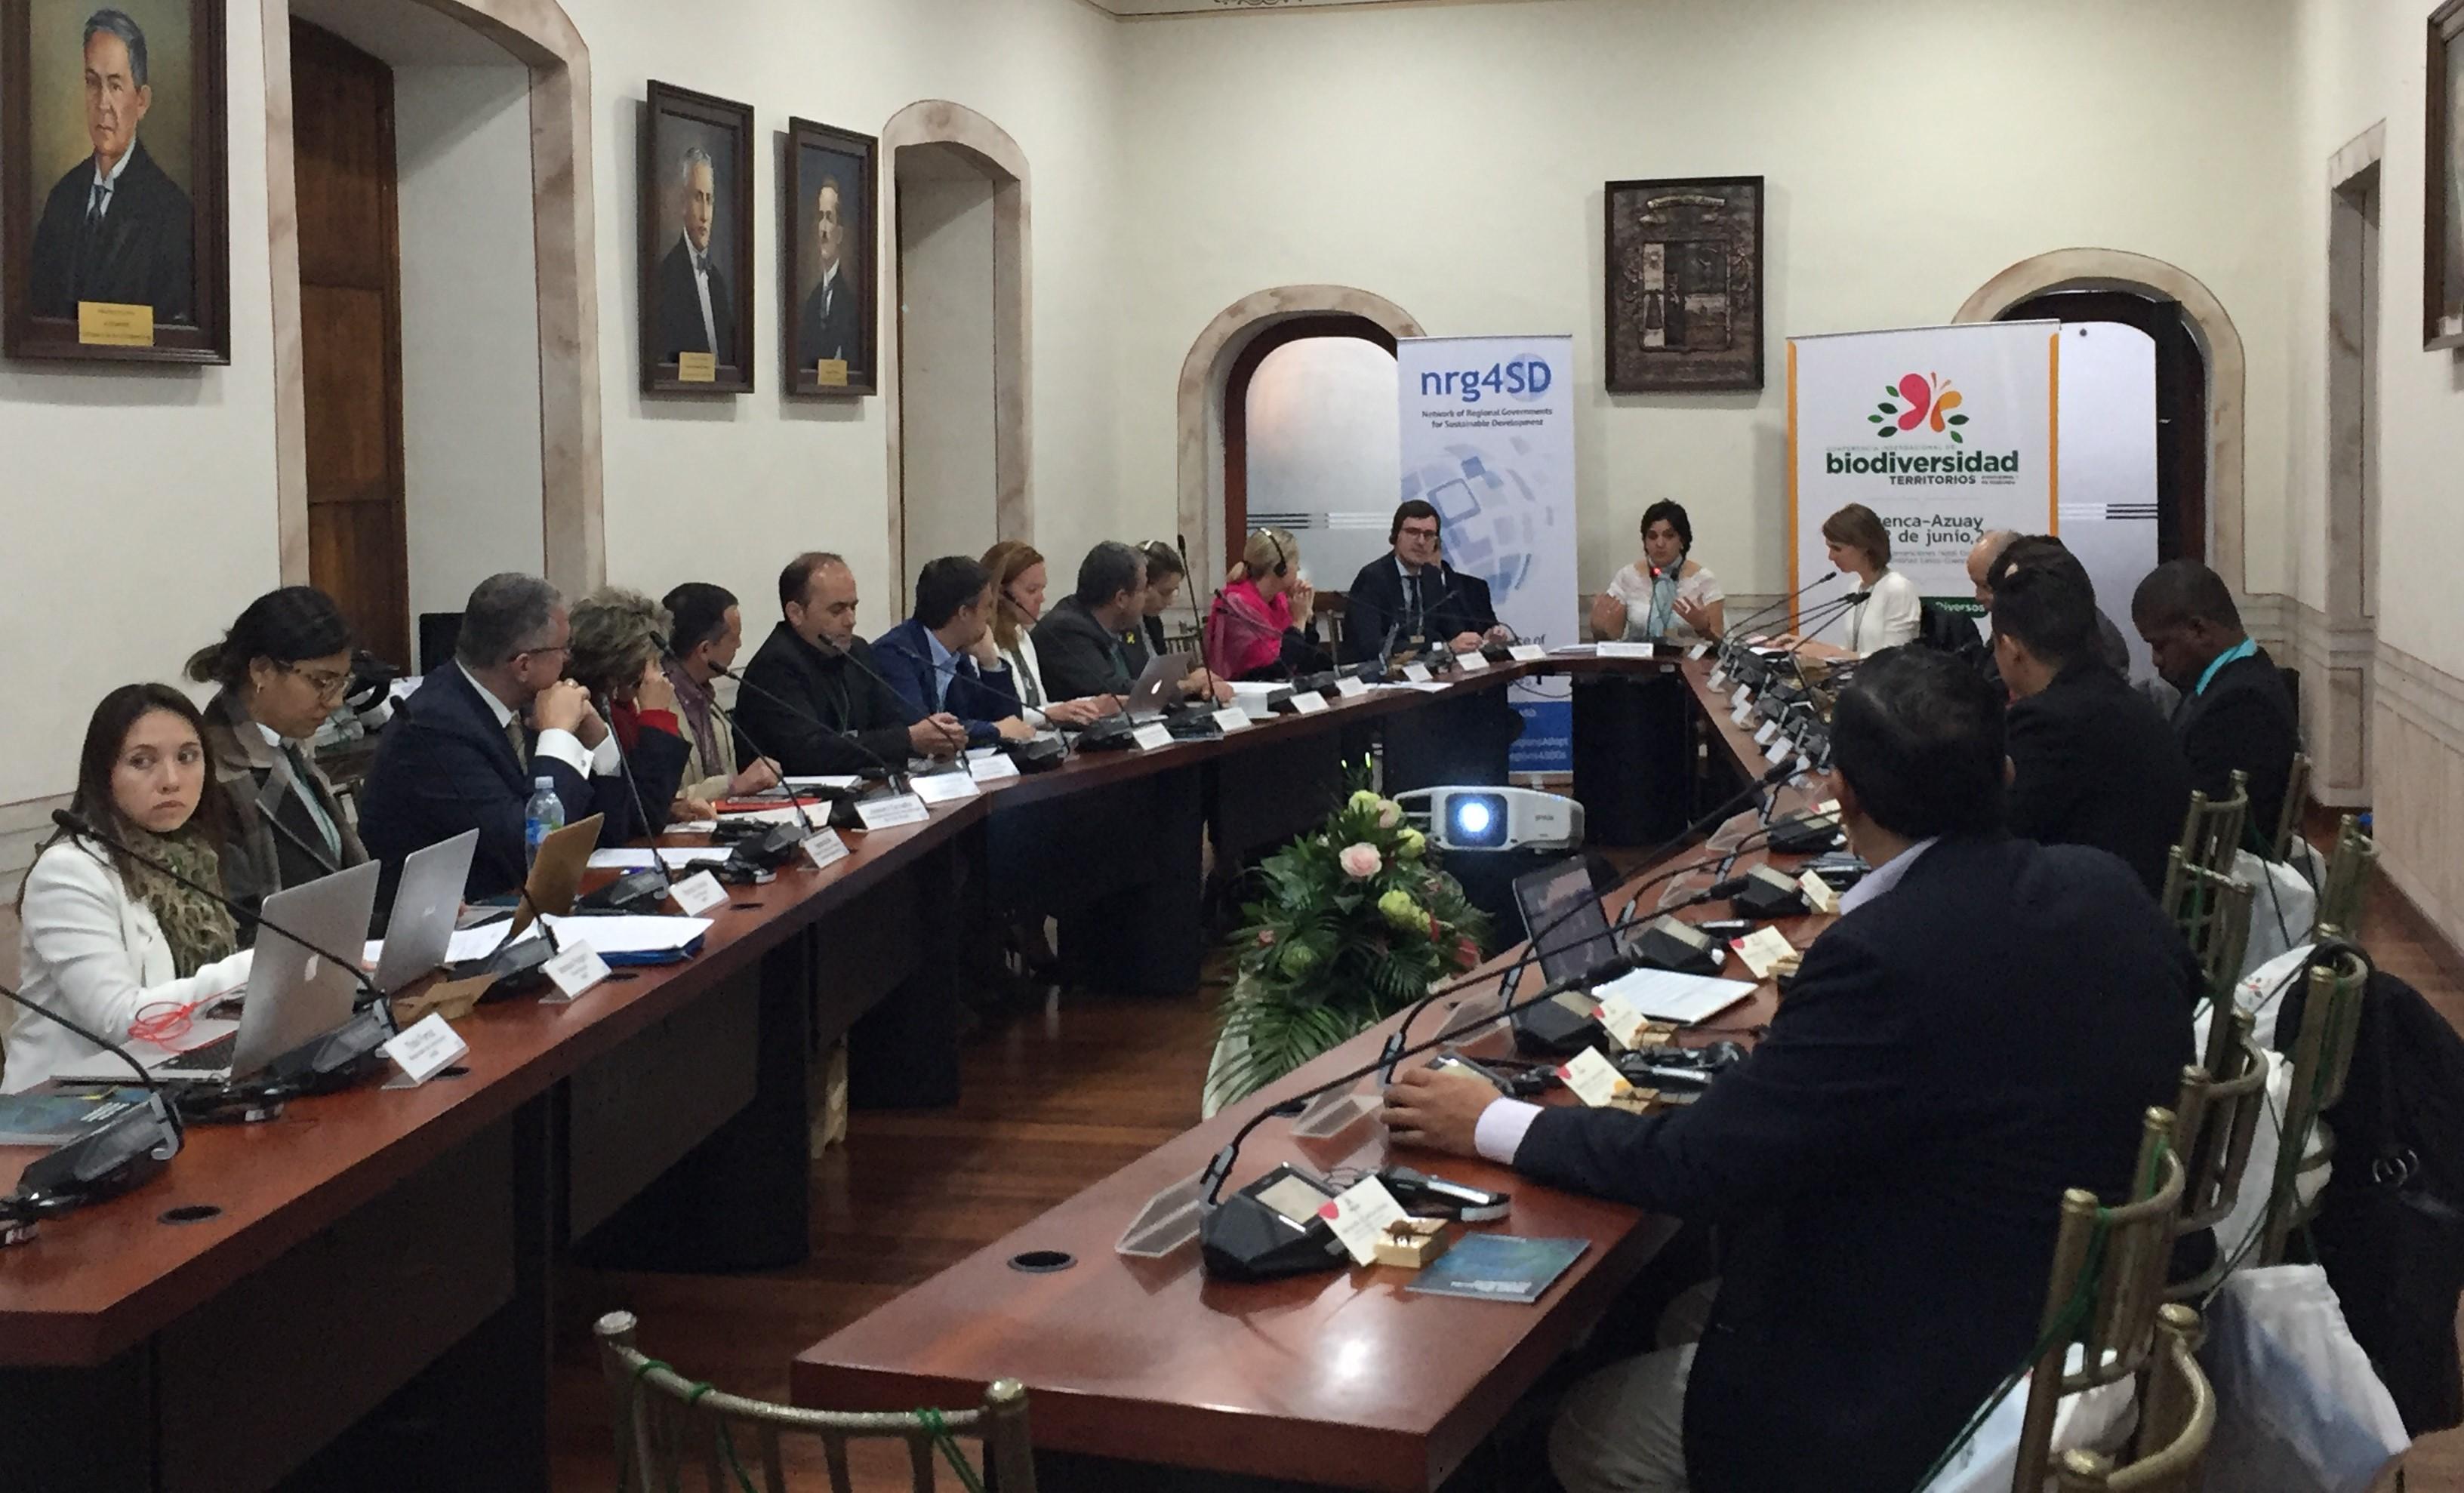 Asamblea_General_nrg4SD_2018.JPG